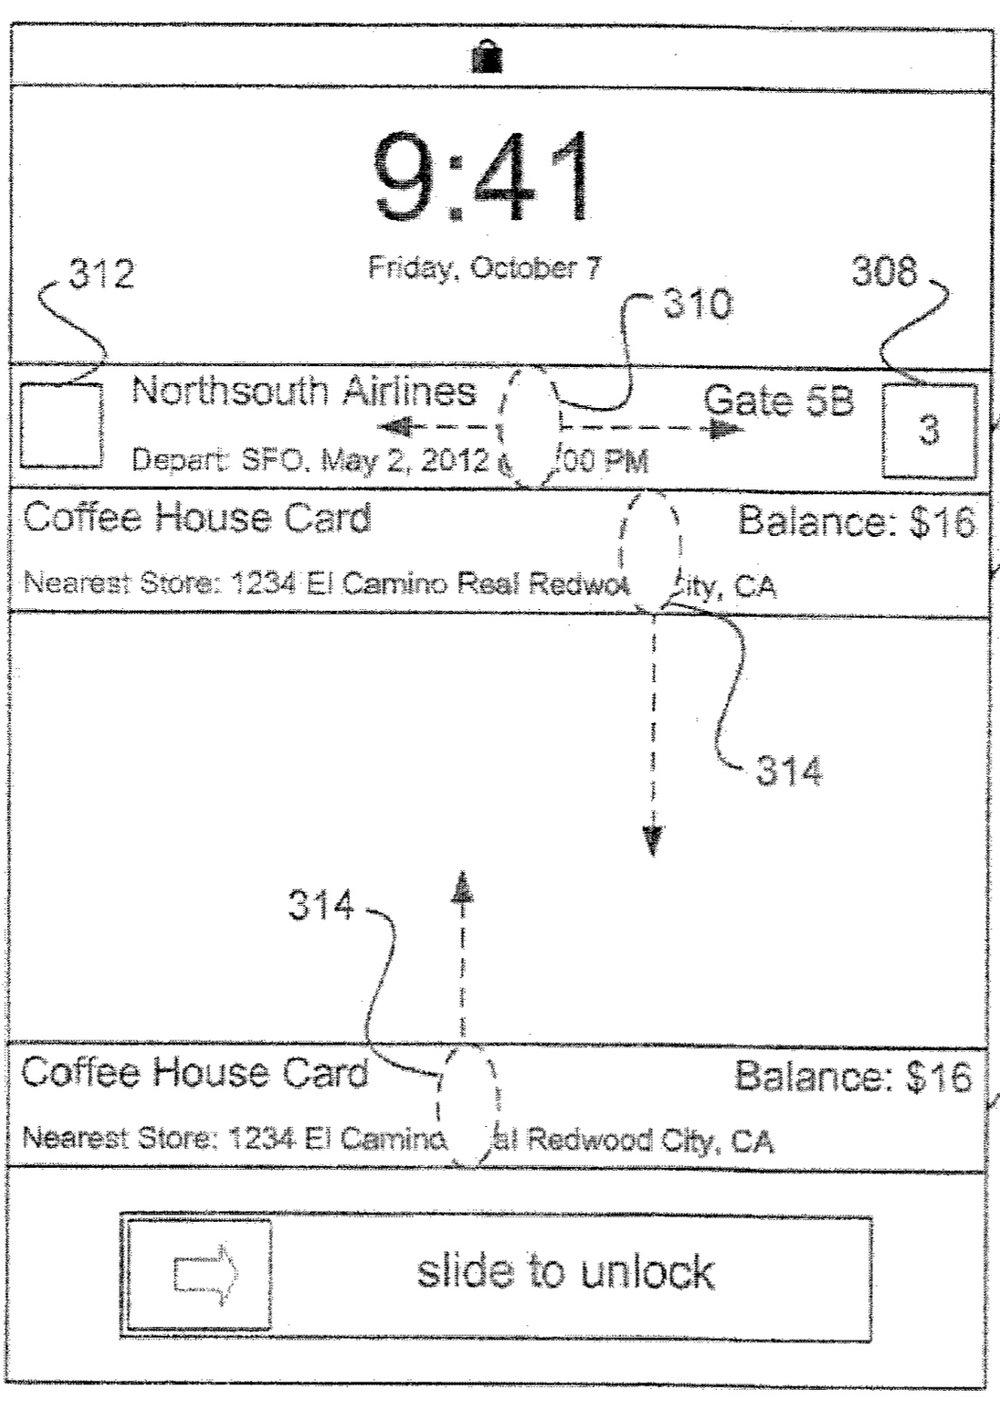 Coupons patent.jpeg